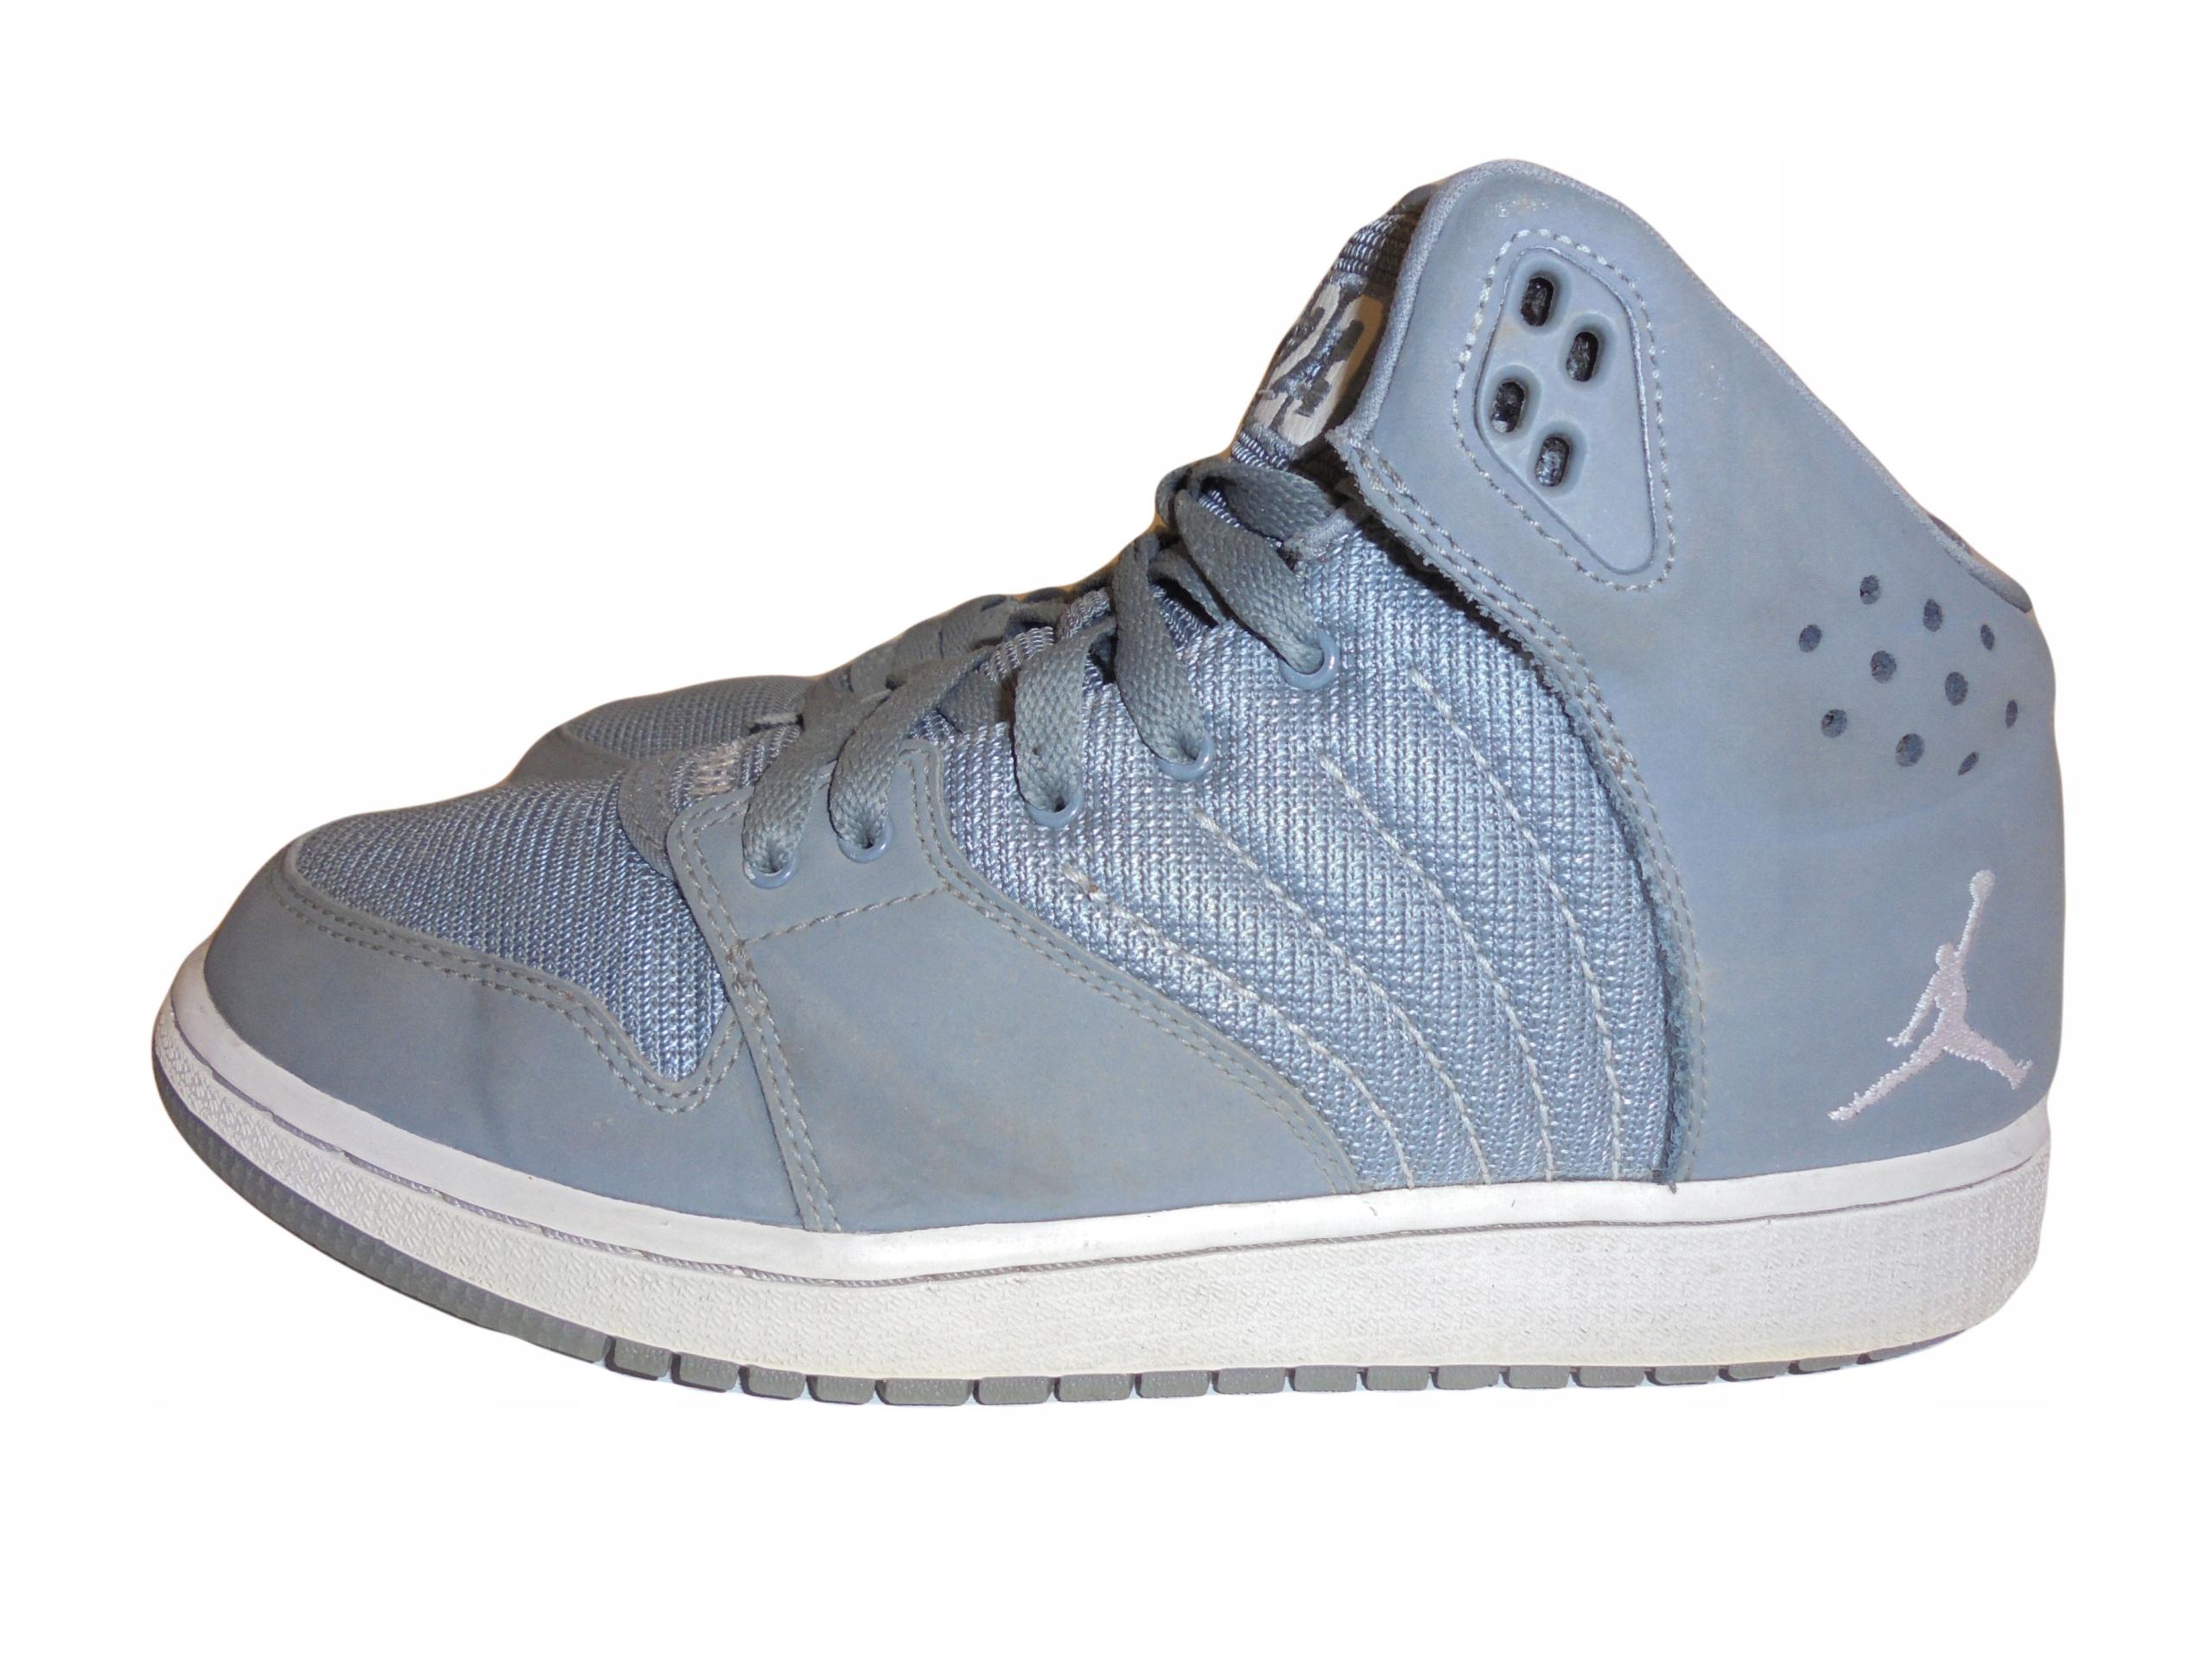 Nike huarache 39 40 tubular adidas superstar air max thea